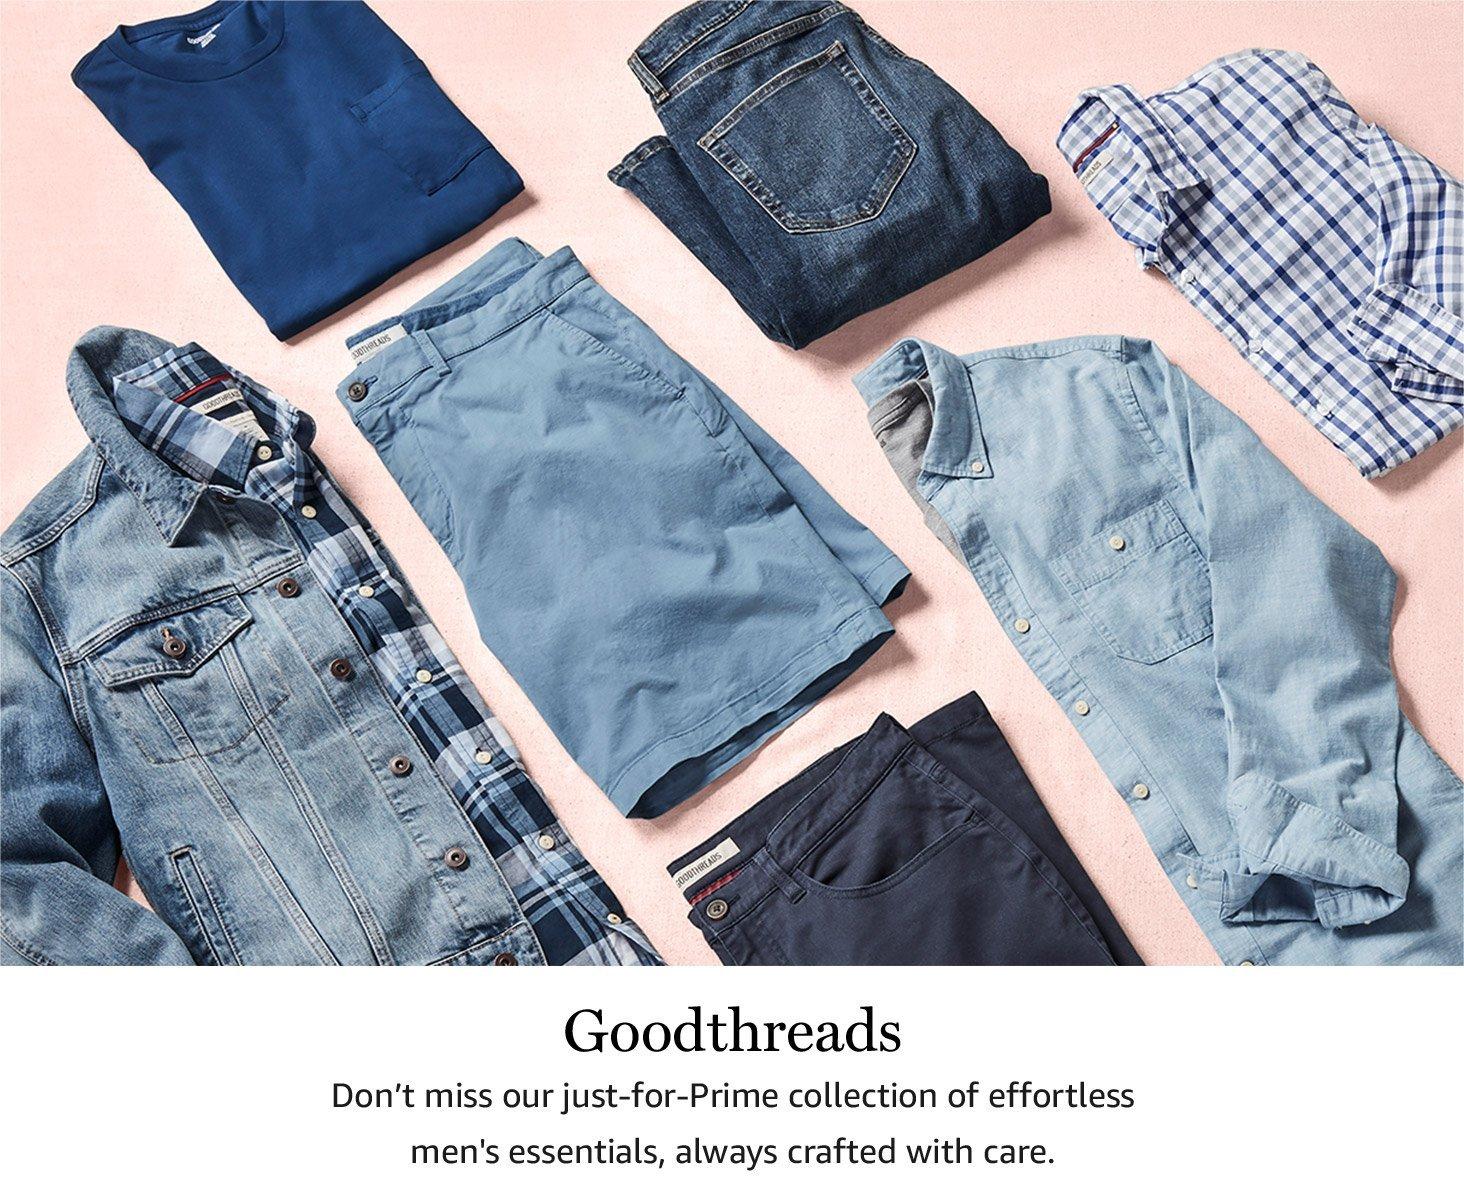 Goodthreads